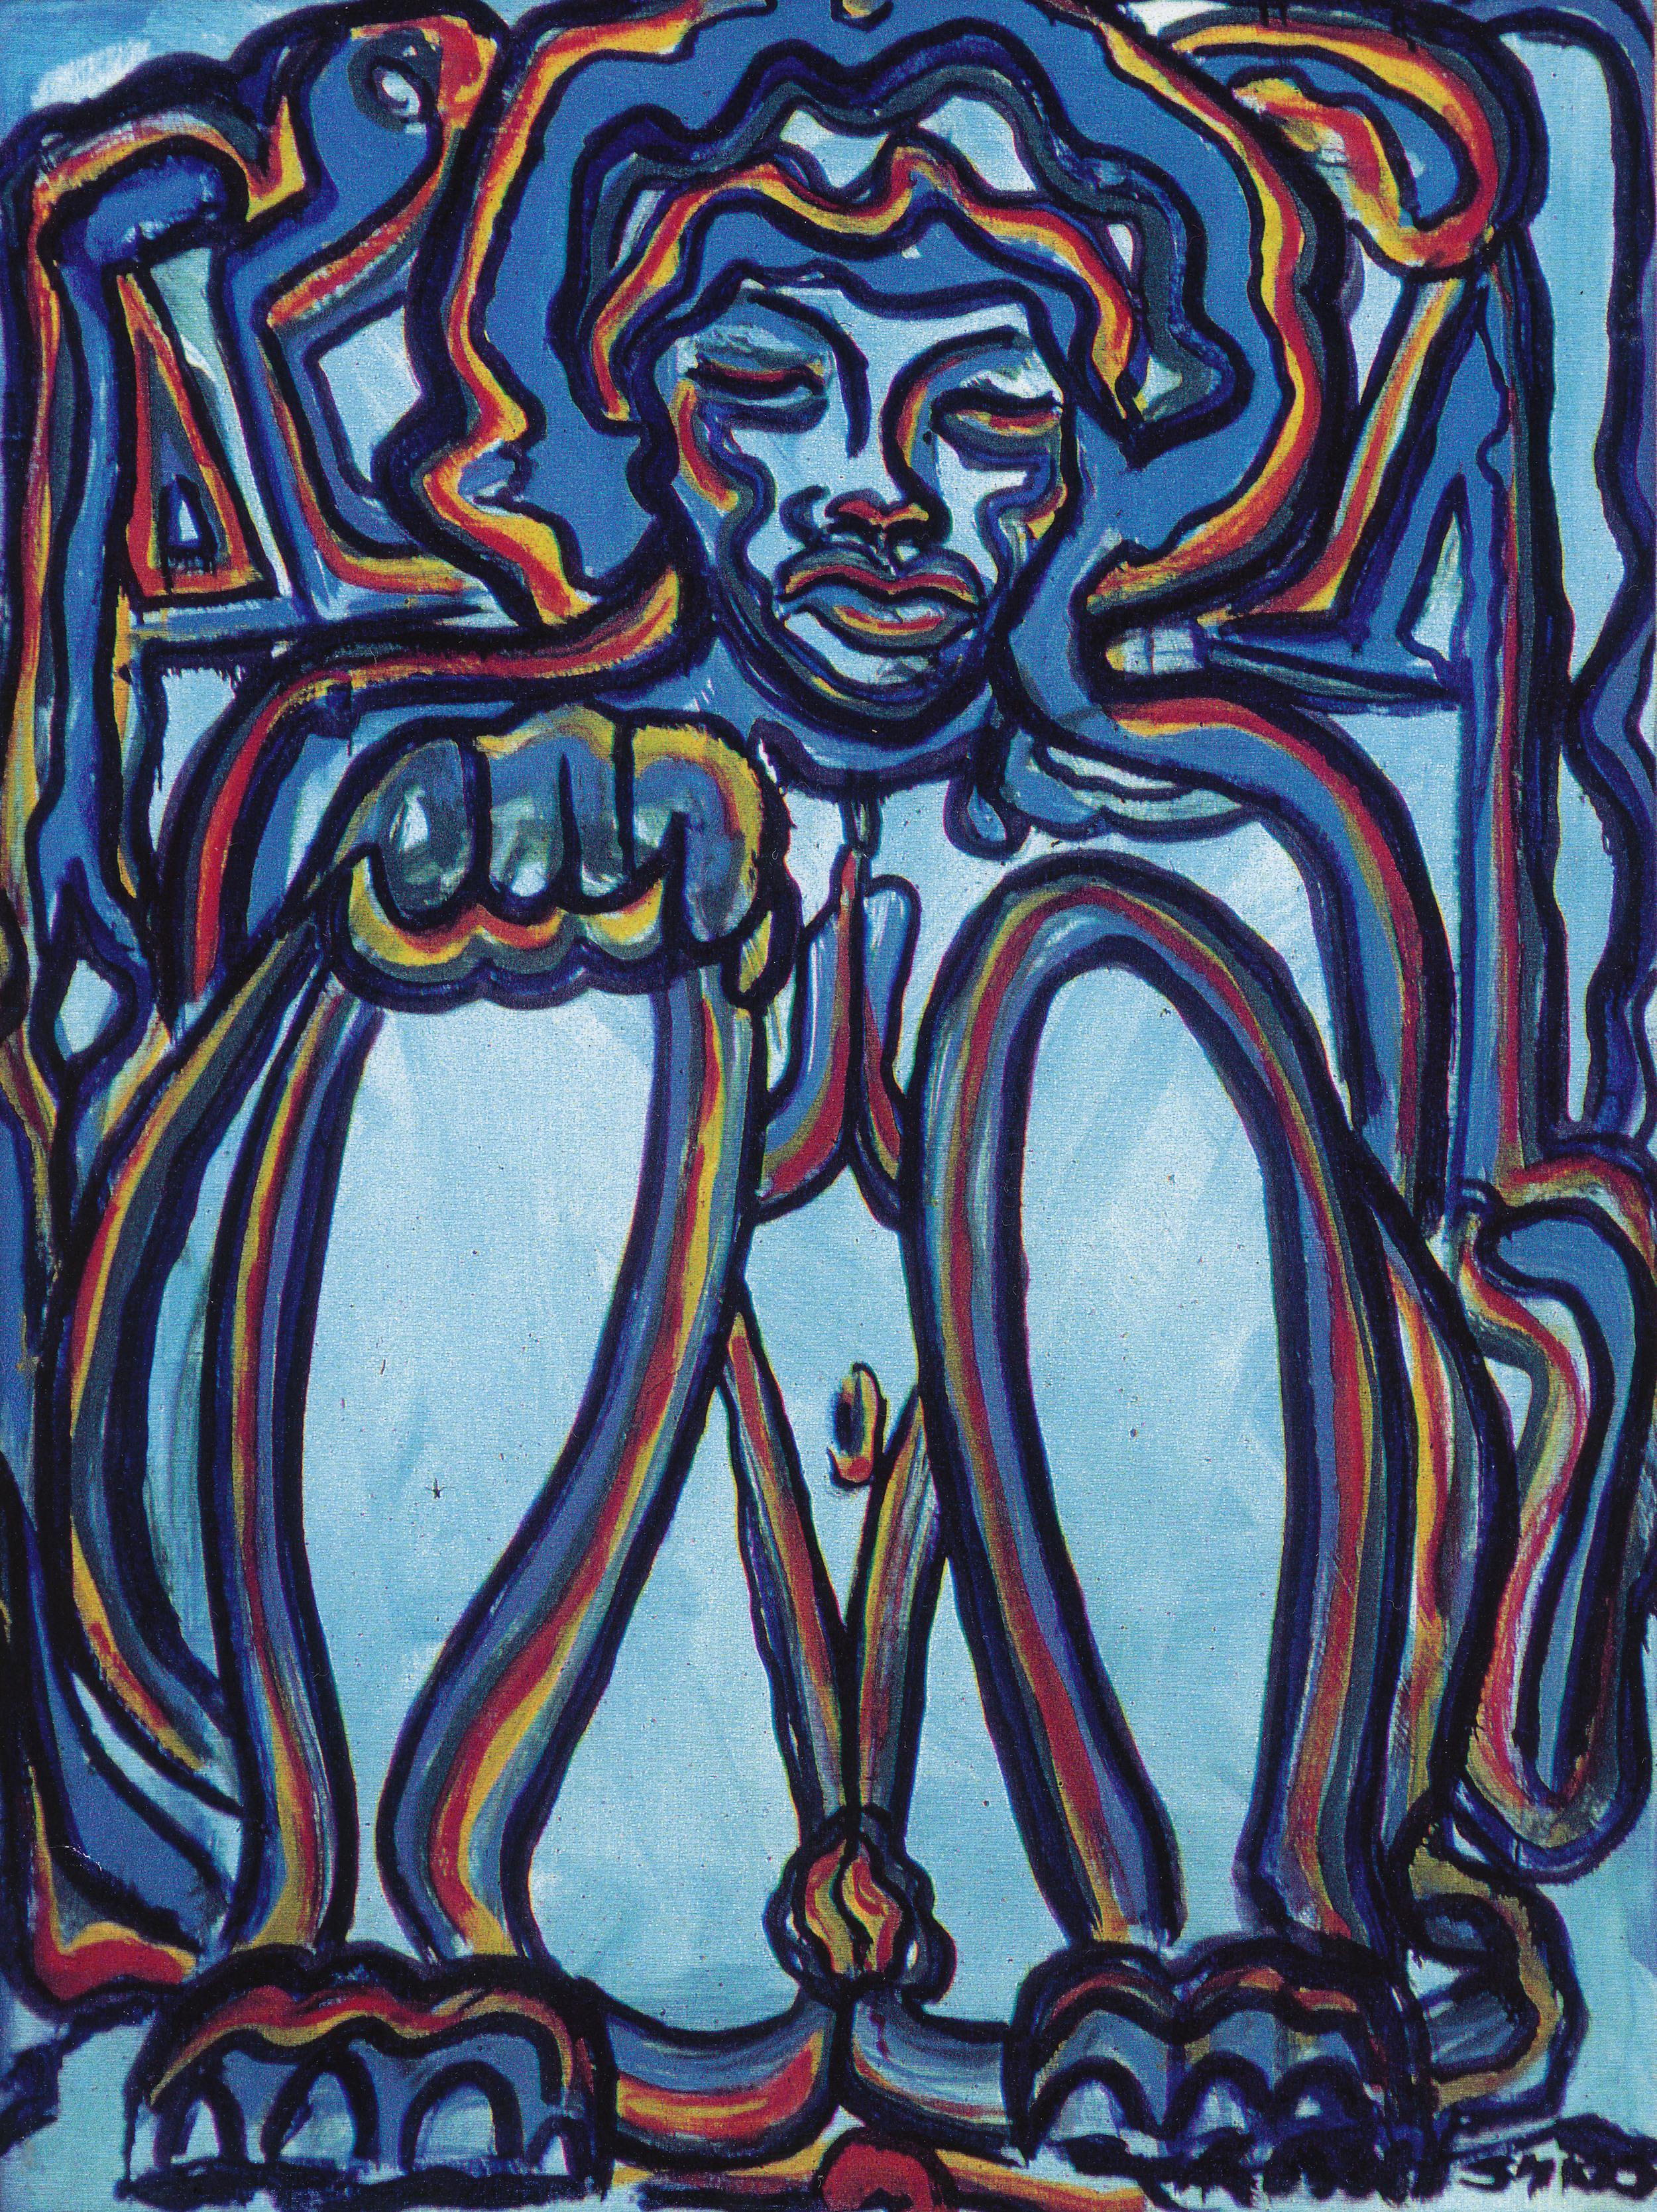 Sittin' Nude - Blue 1967